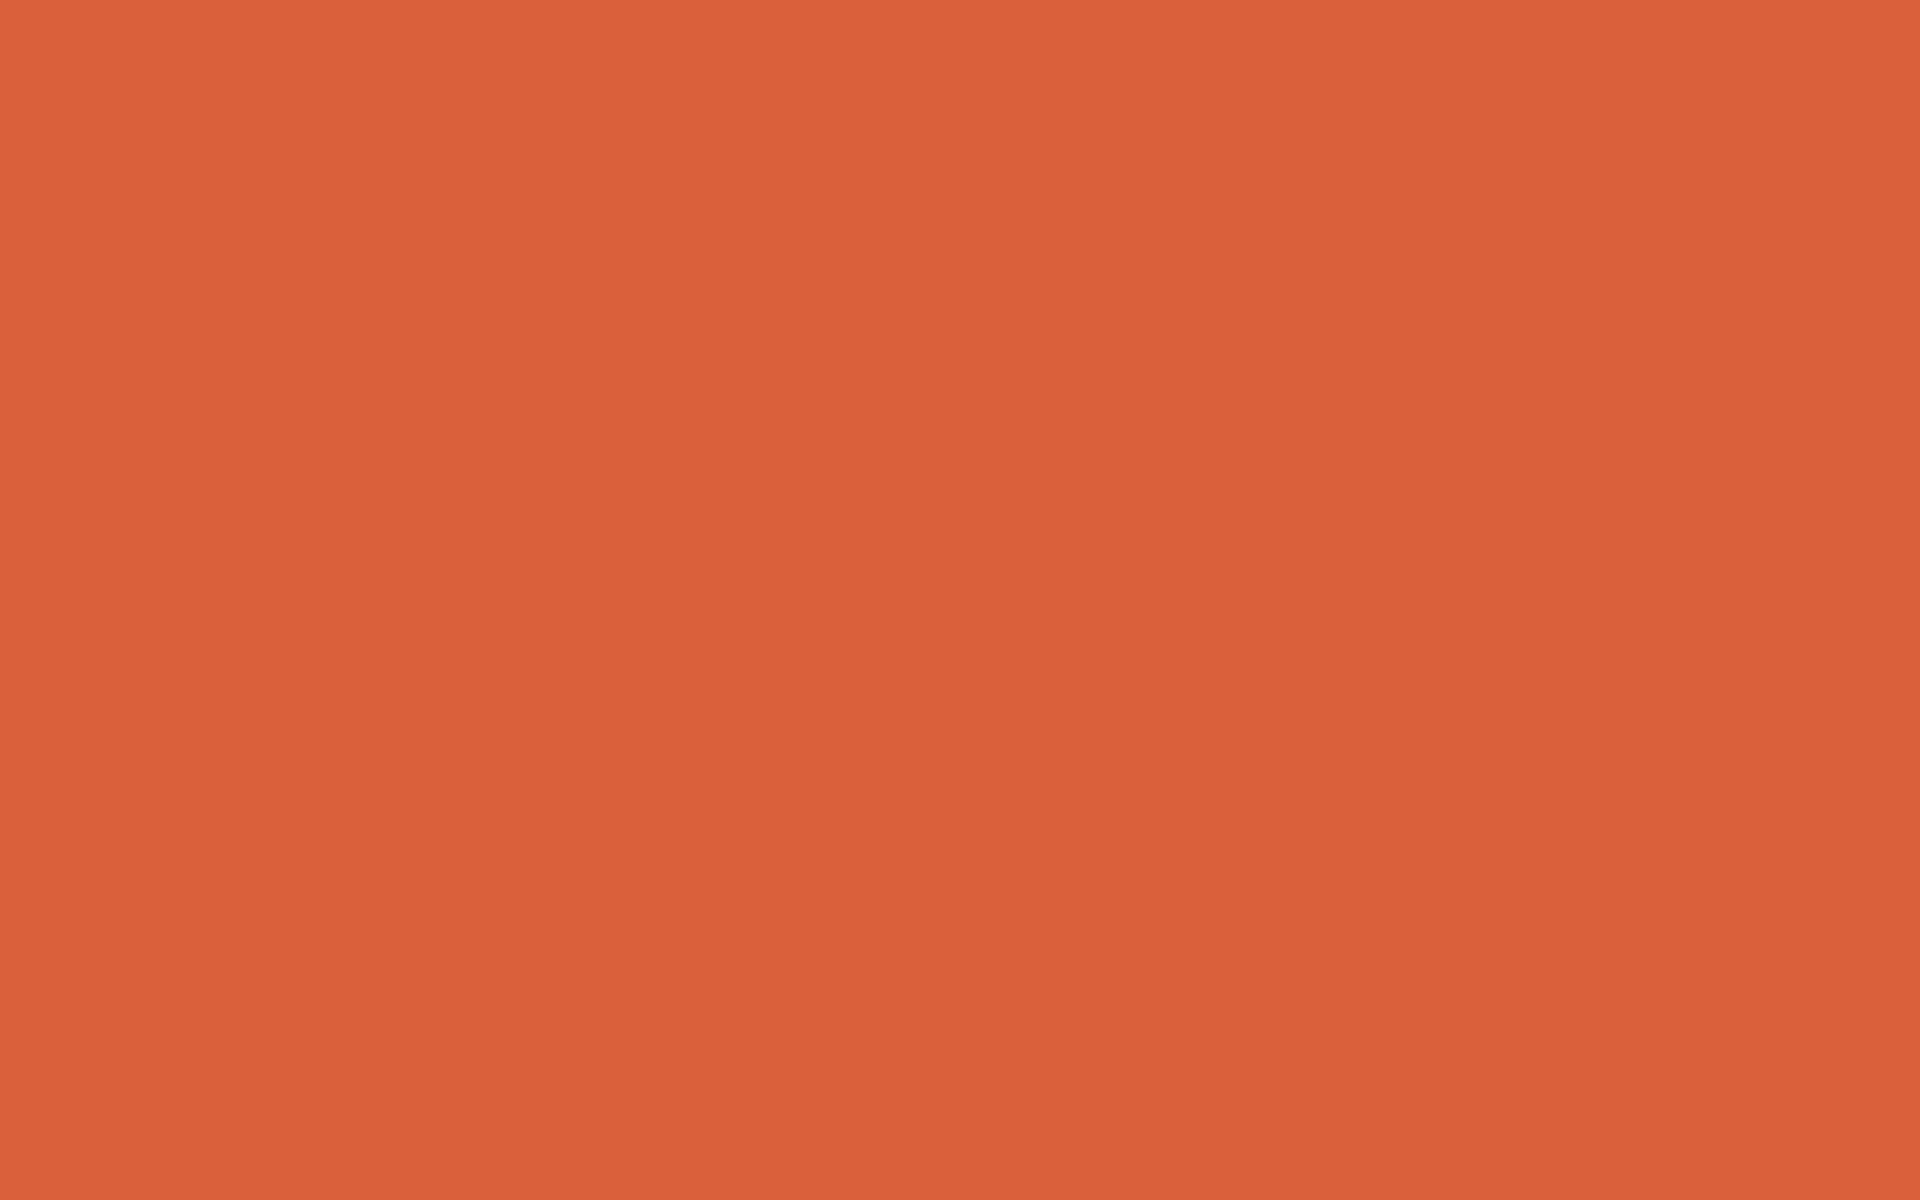 1920x1200 Medium Vermilion Solid Color Background